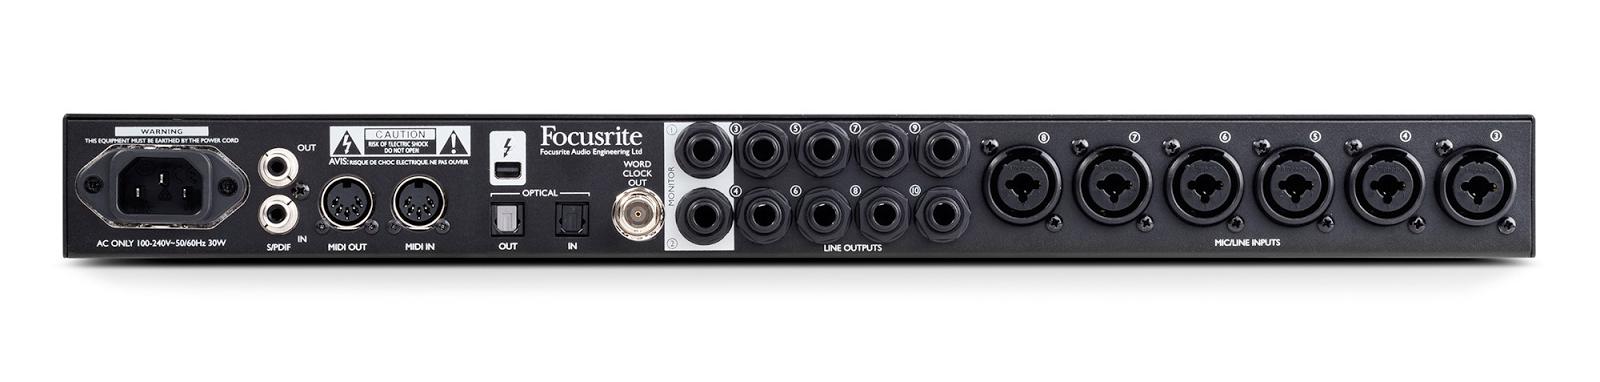 cymatics-best audio interface-focusrite